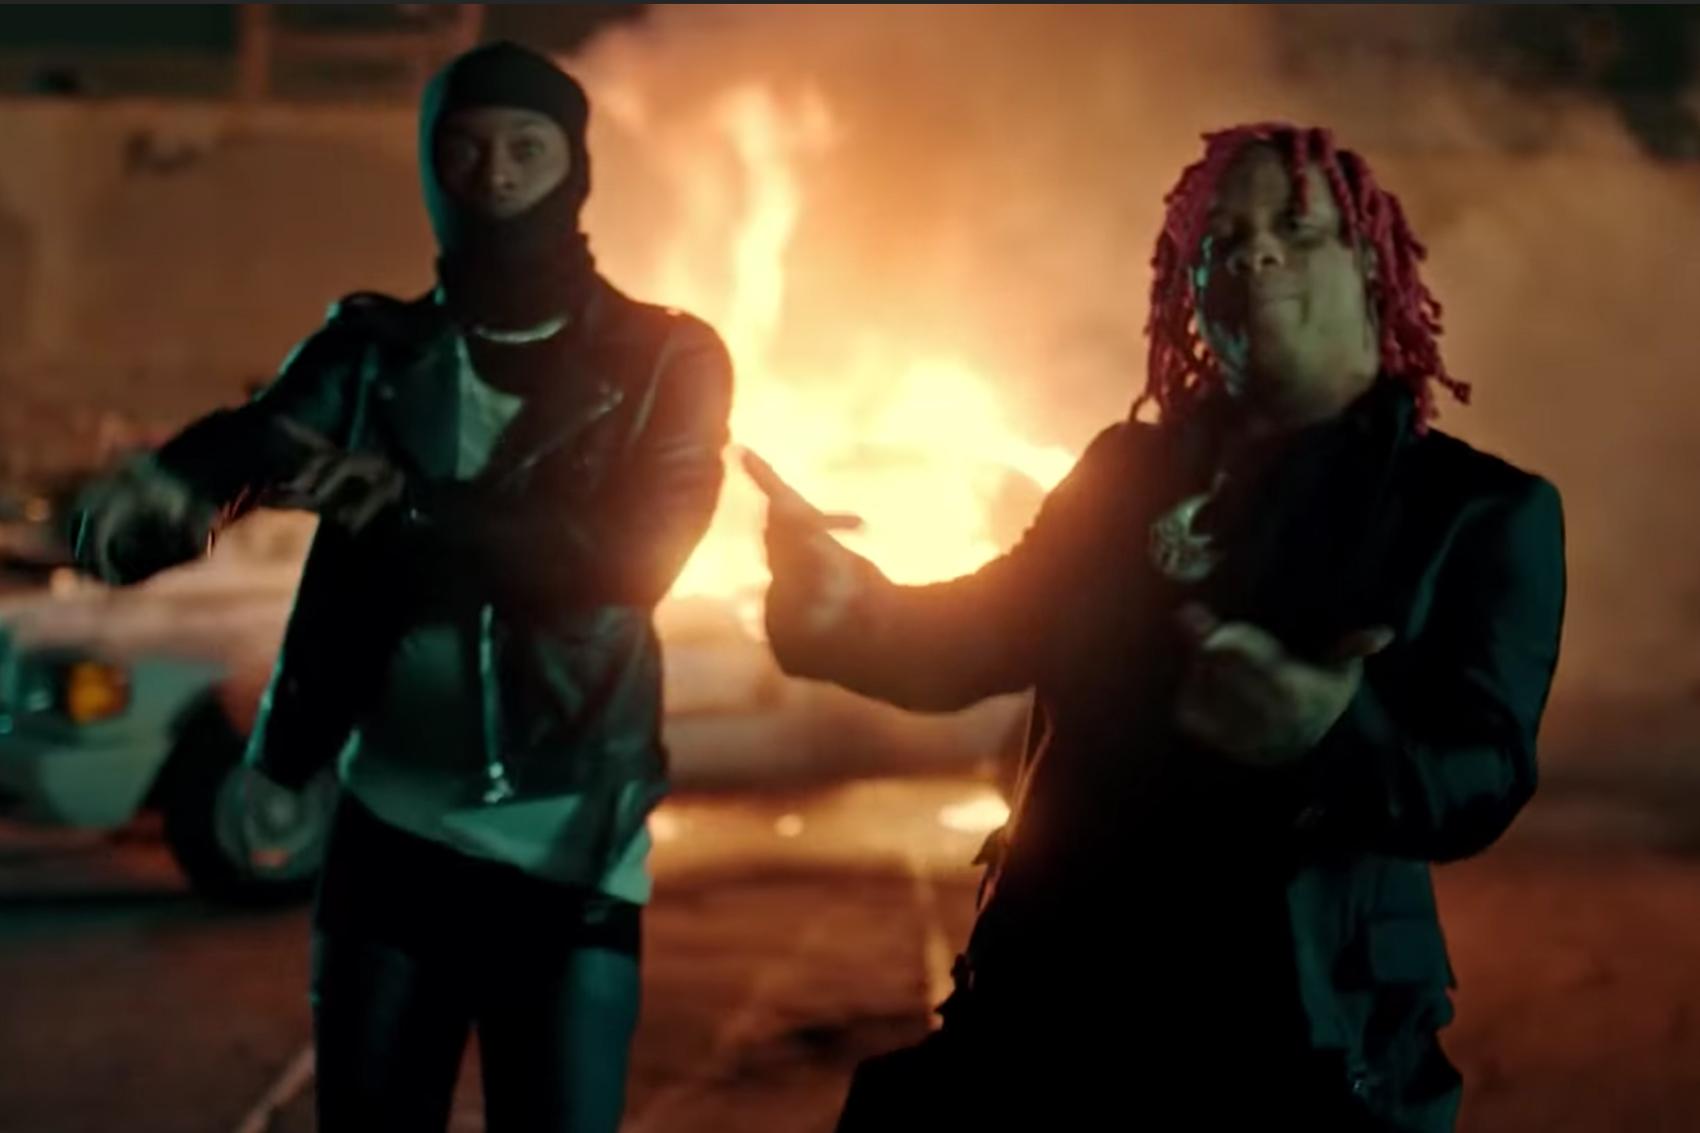 Trippie Redd, Playboi Carti Blow It Up With 'Miss the Rage' Video